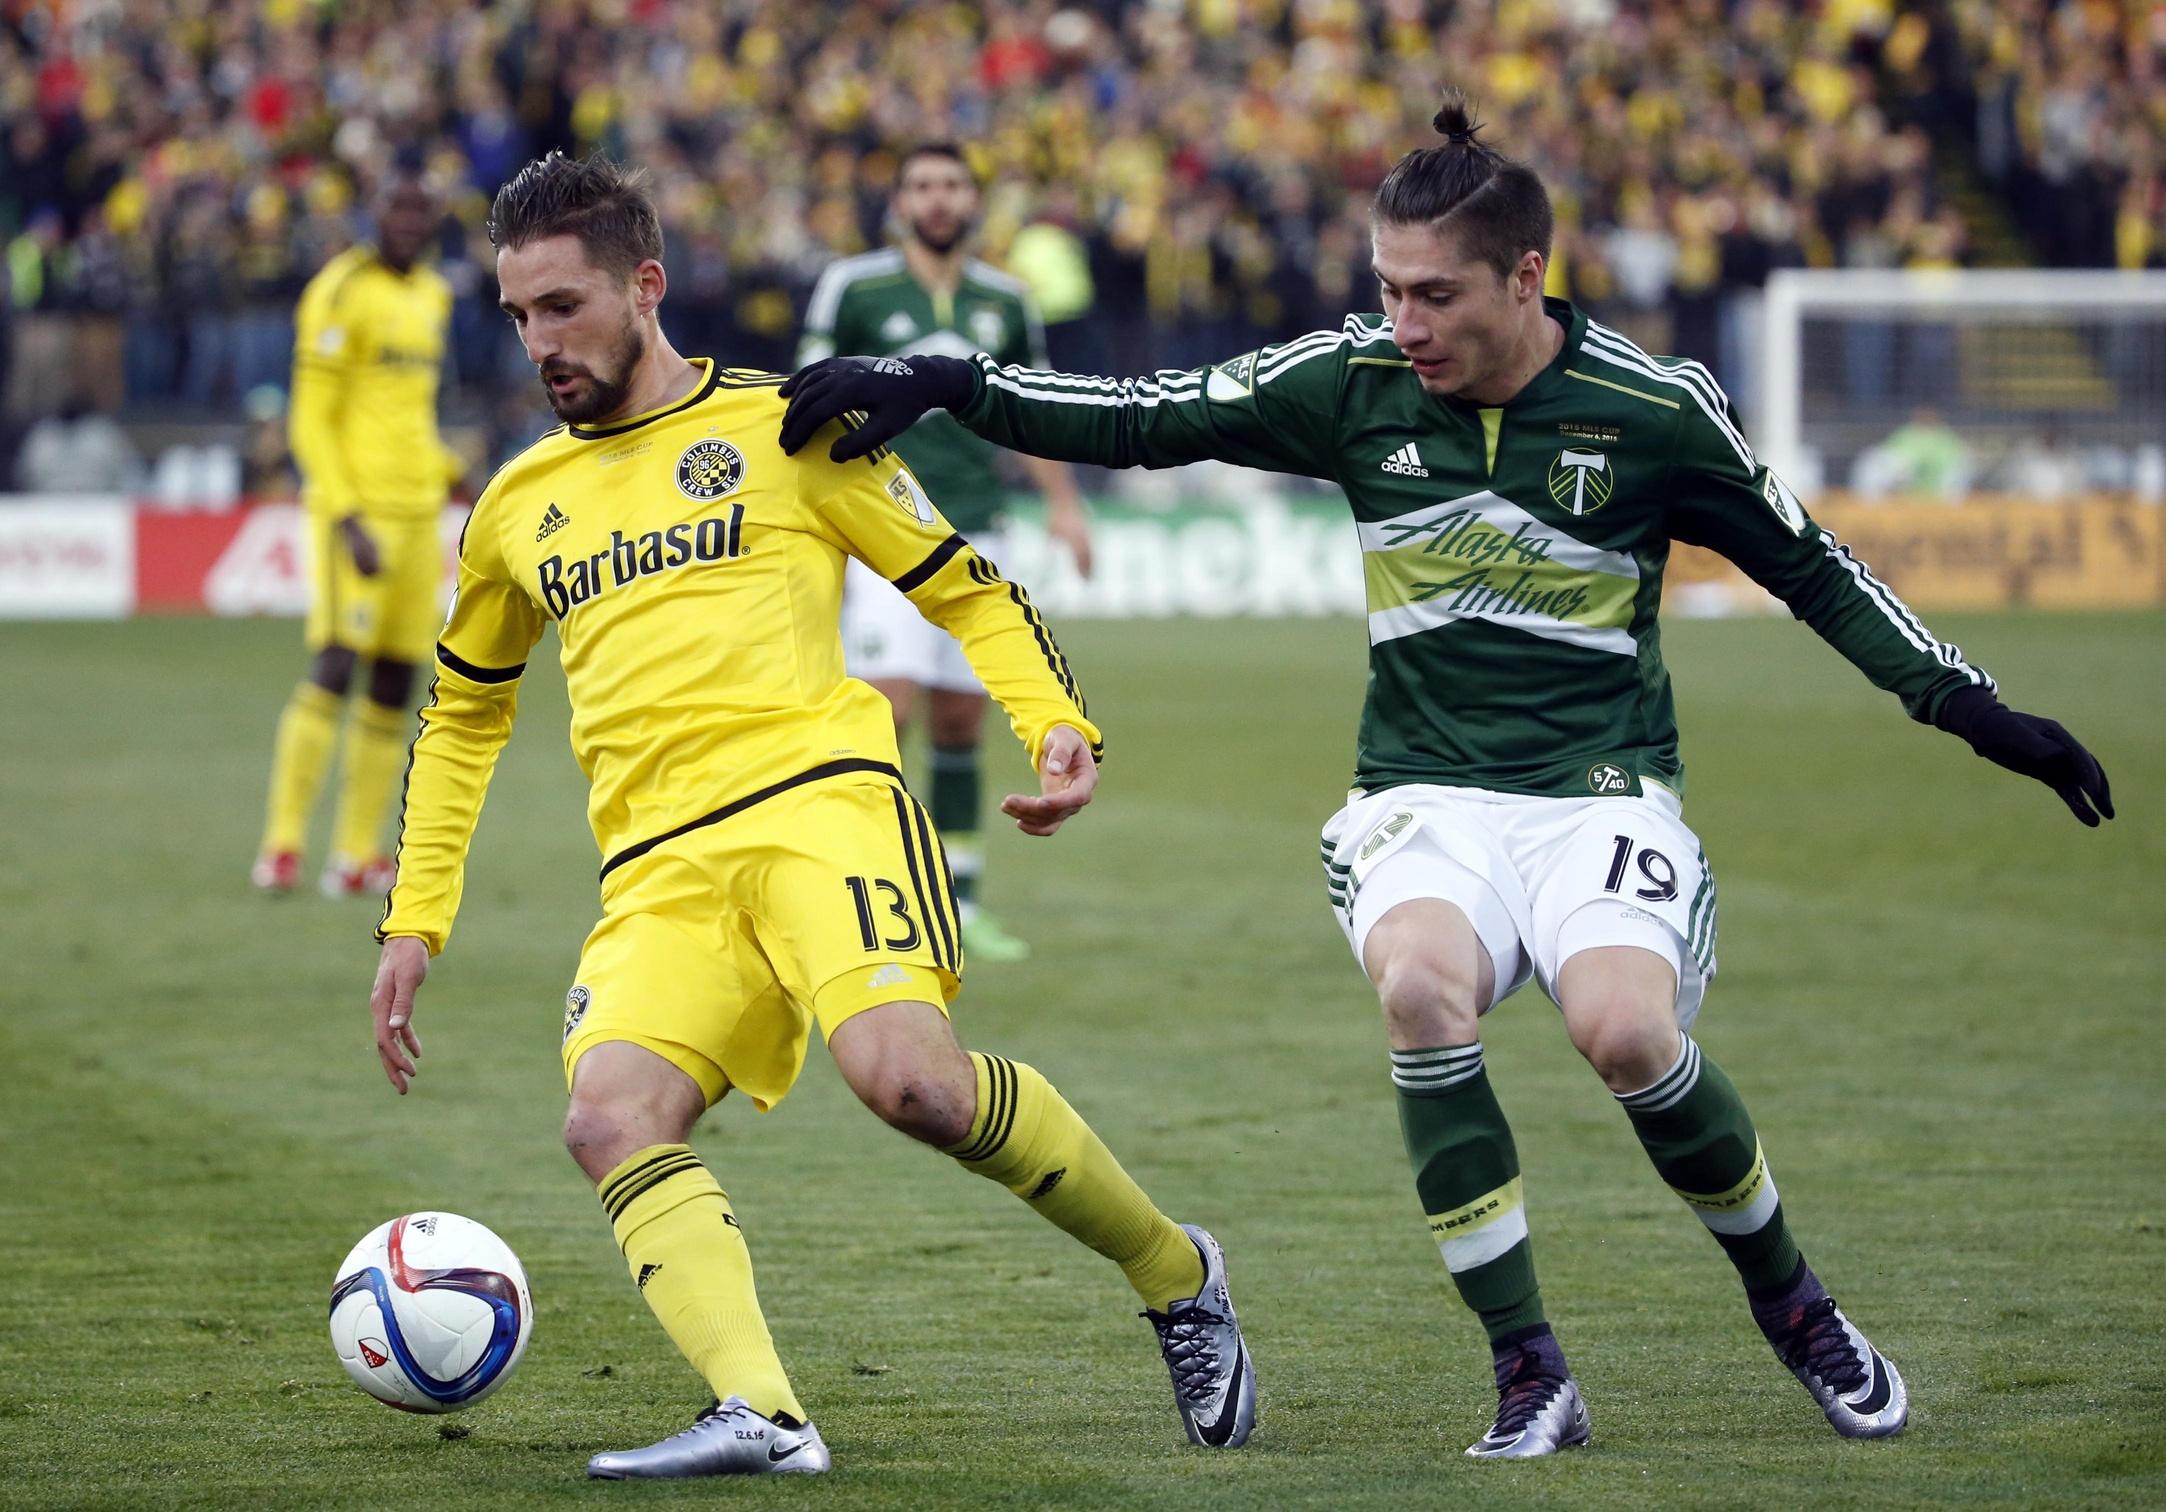 MLS CUP_Villafana_Finlay by usats